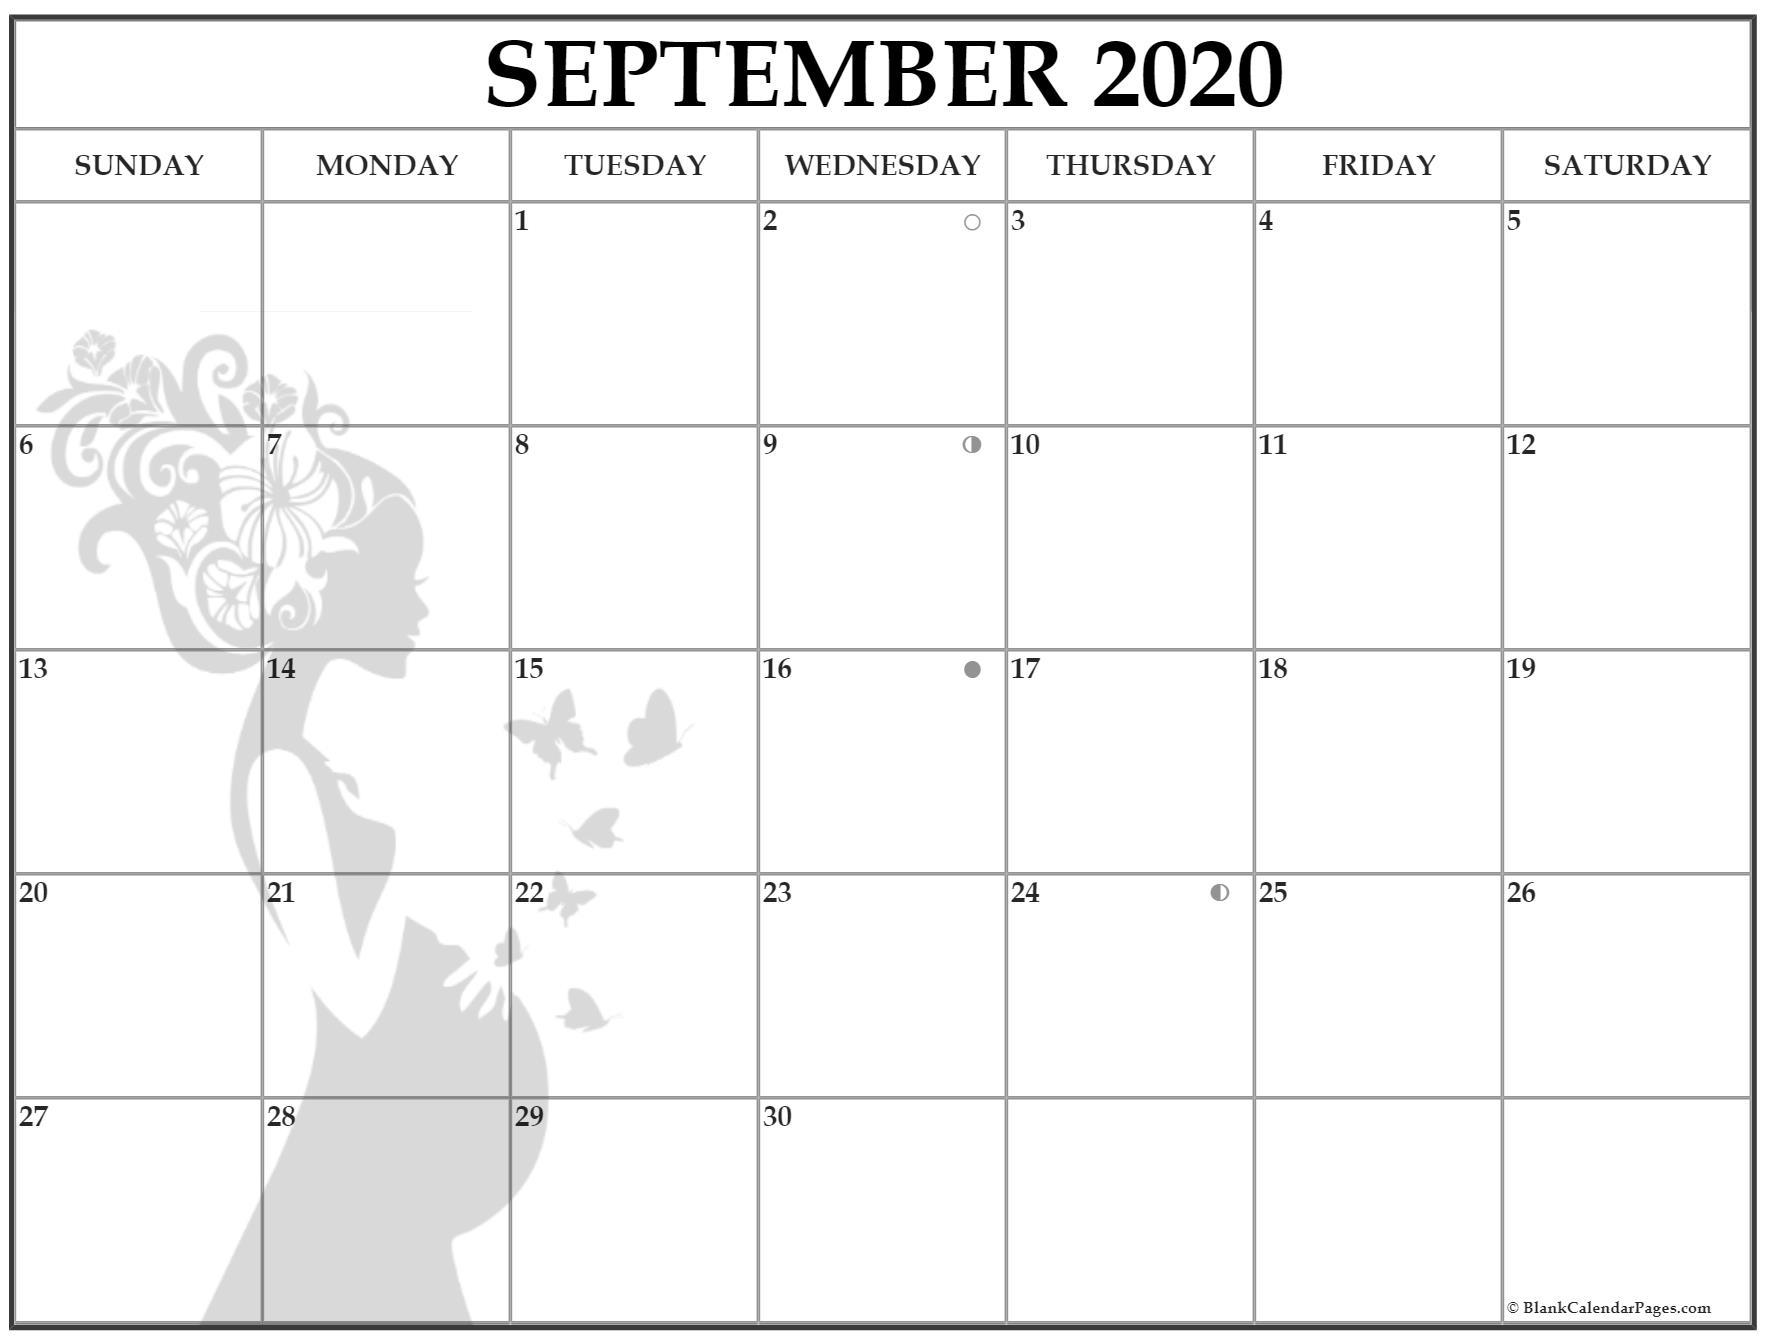 September 2020 Pregnancy Calendar   Fertility Calendar